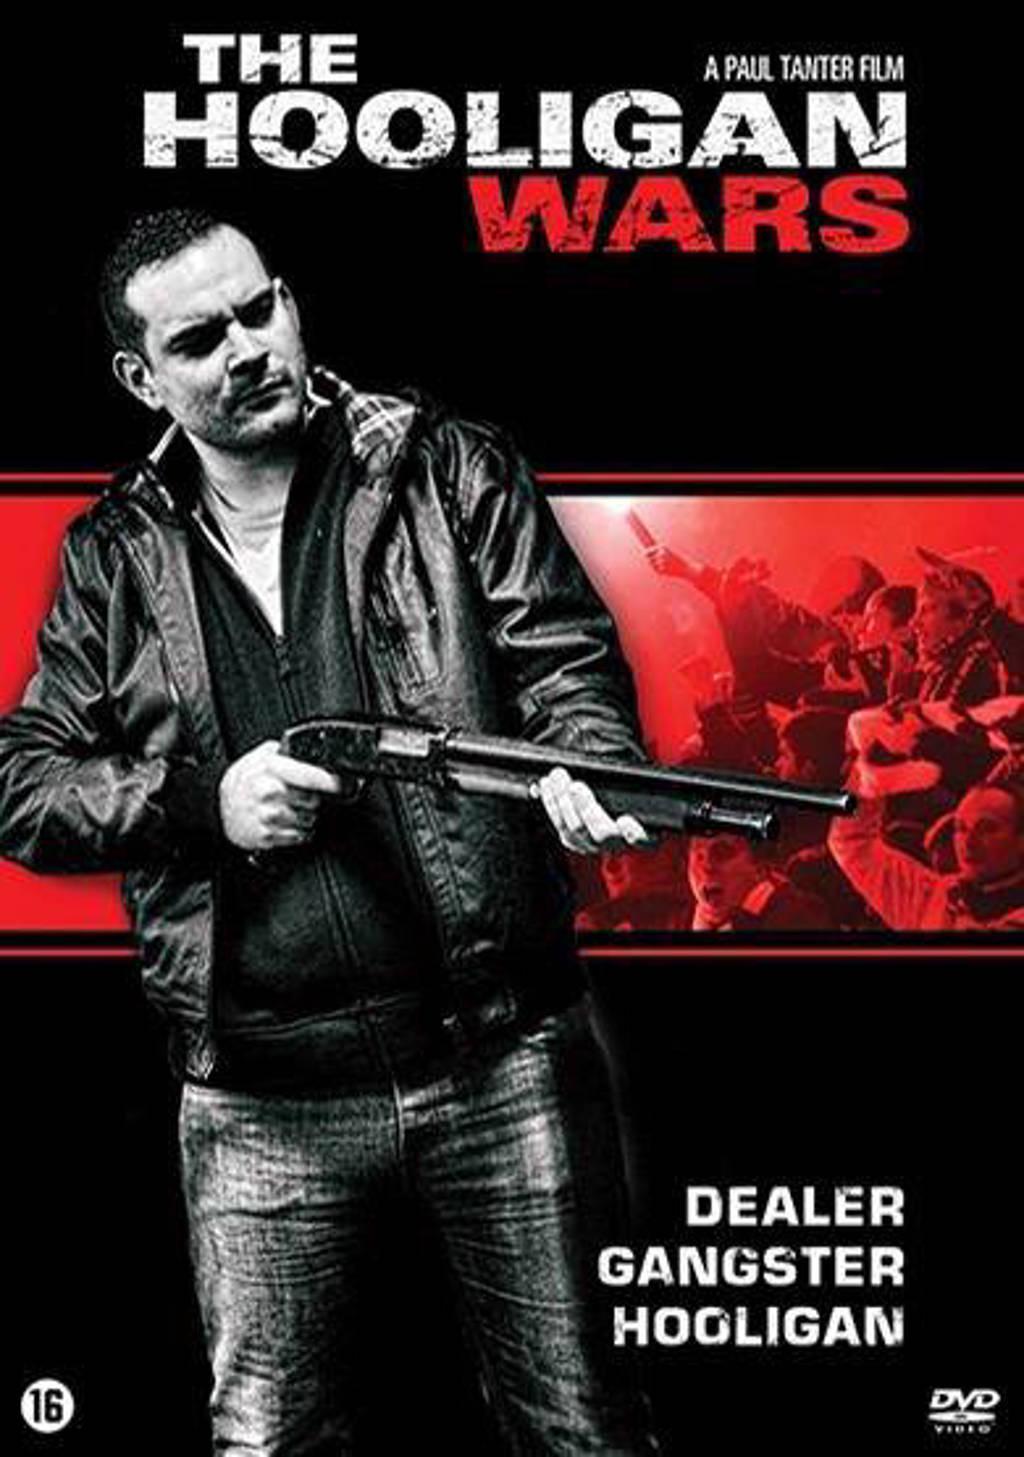 Hooligan wars (DVD)